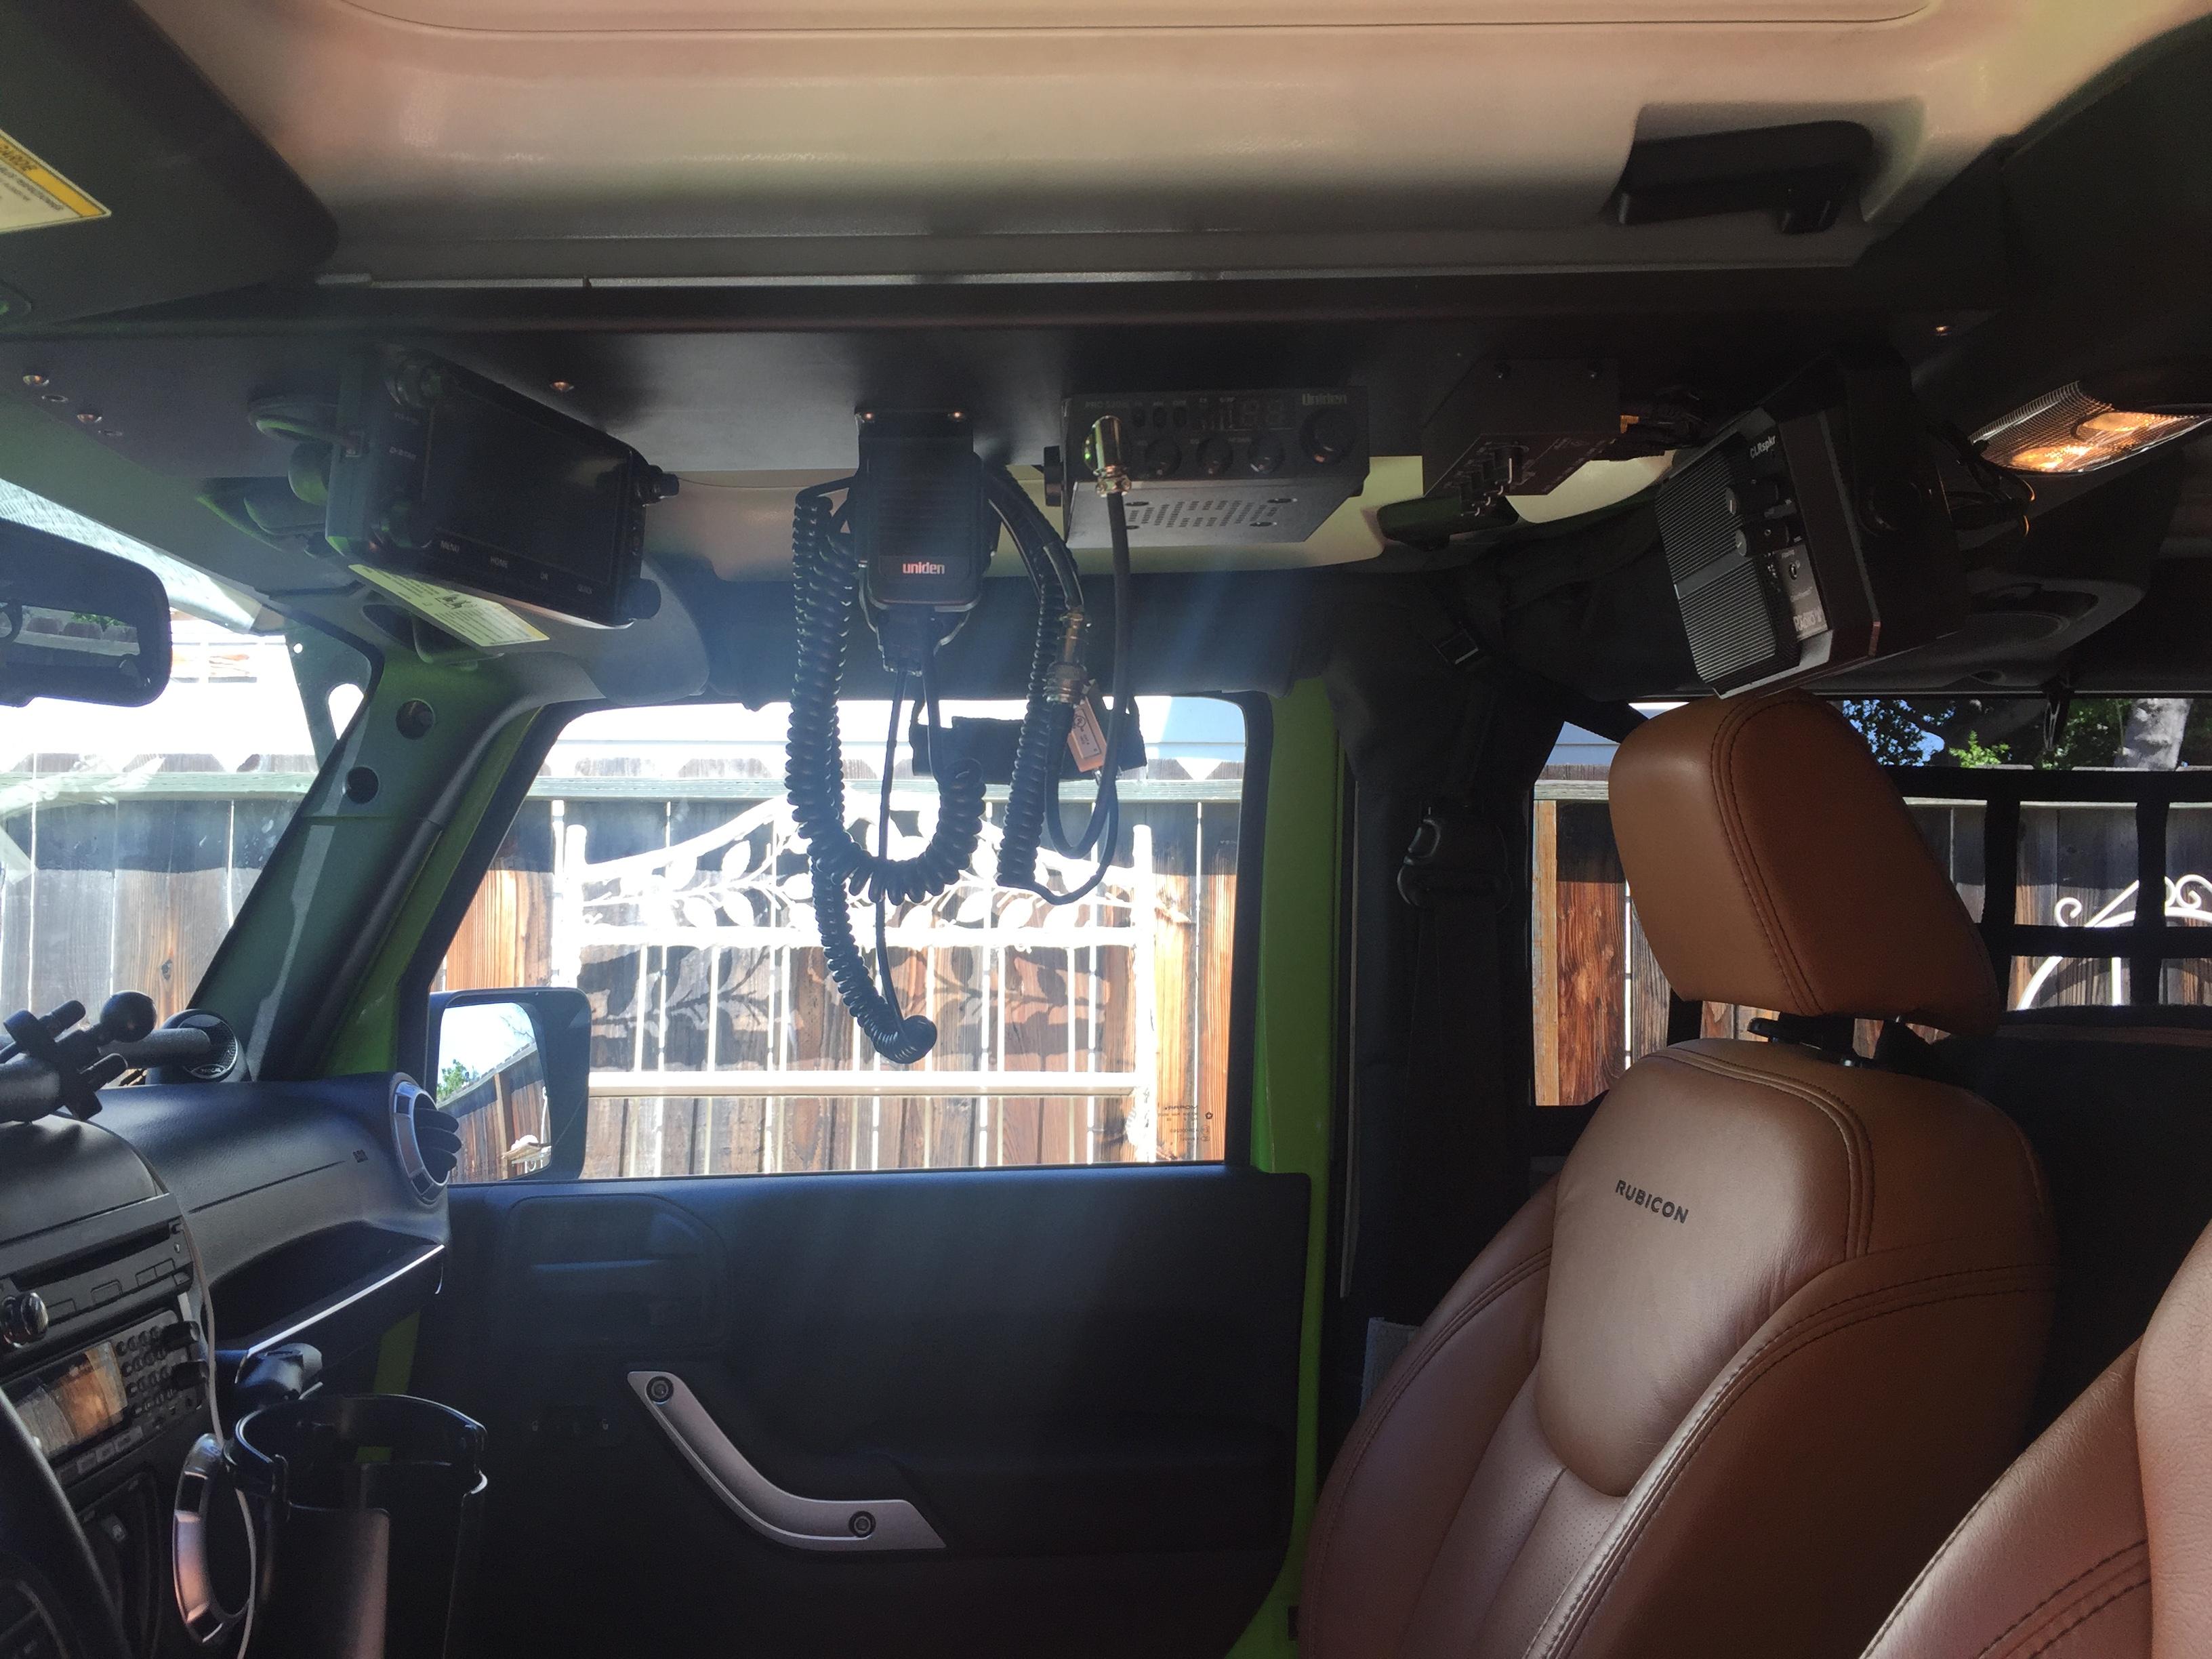 Ham radio folks: bonding a HF setup in a JK - Jeep Wrangler